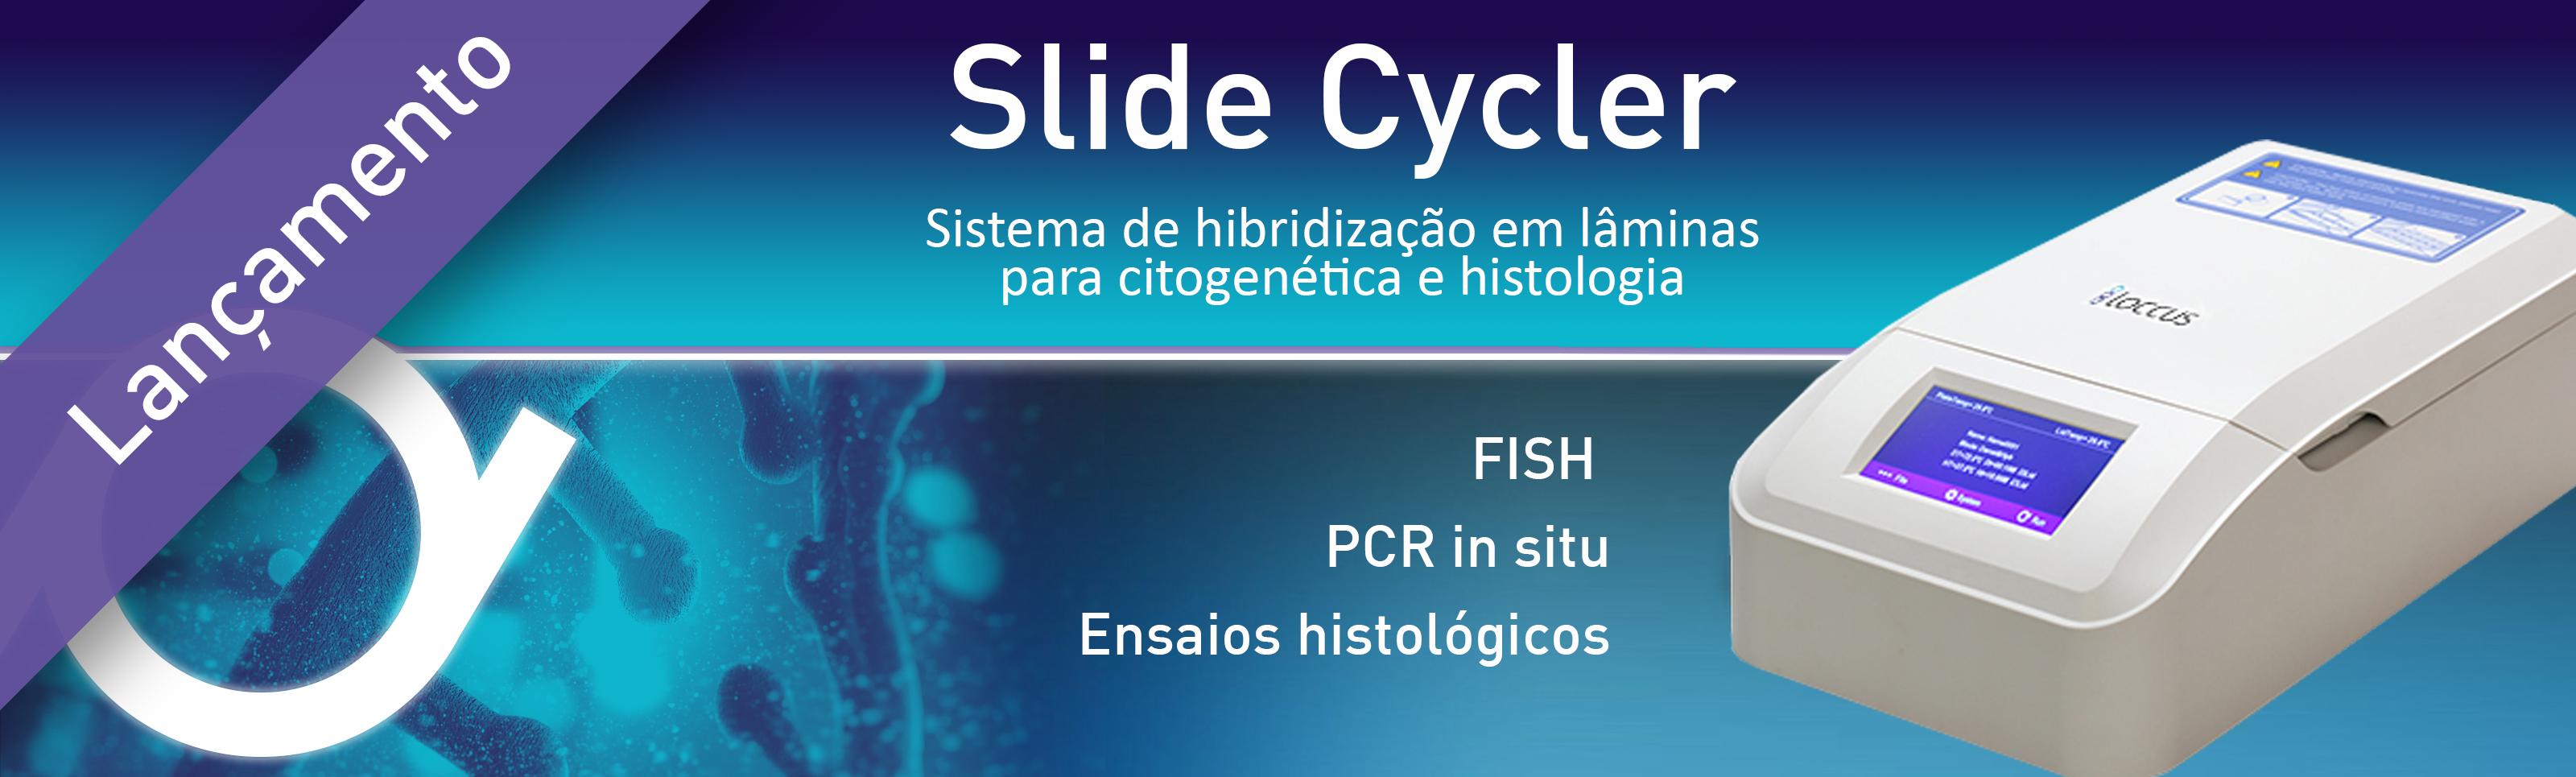 Banner SlideCycler